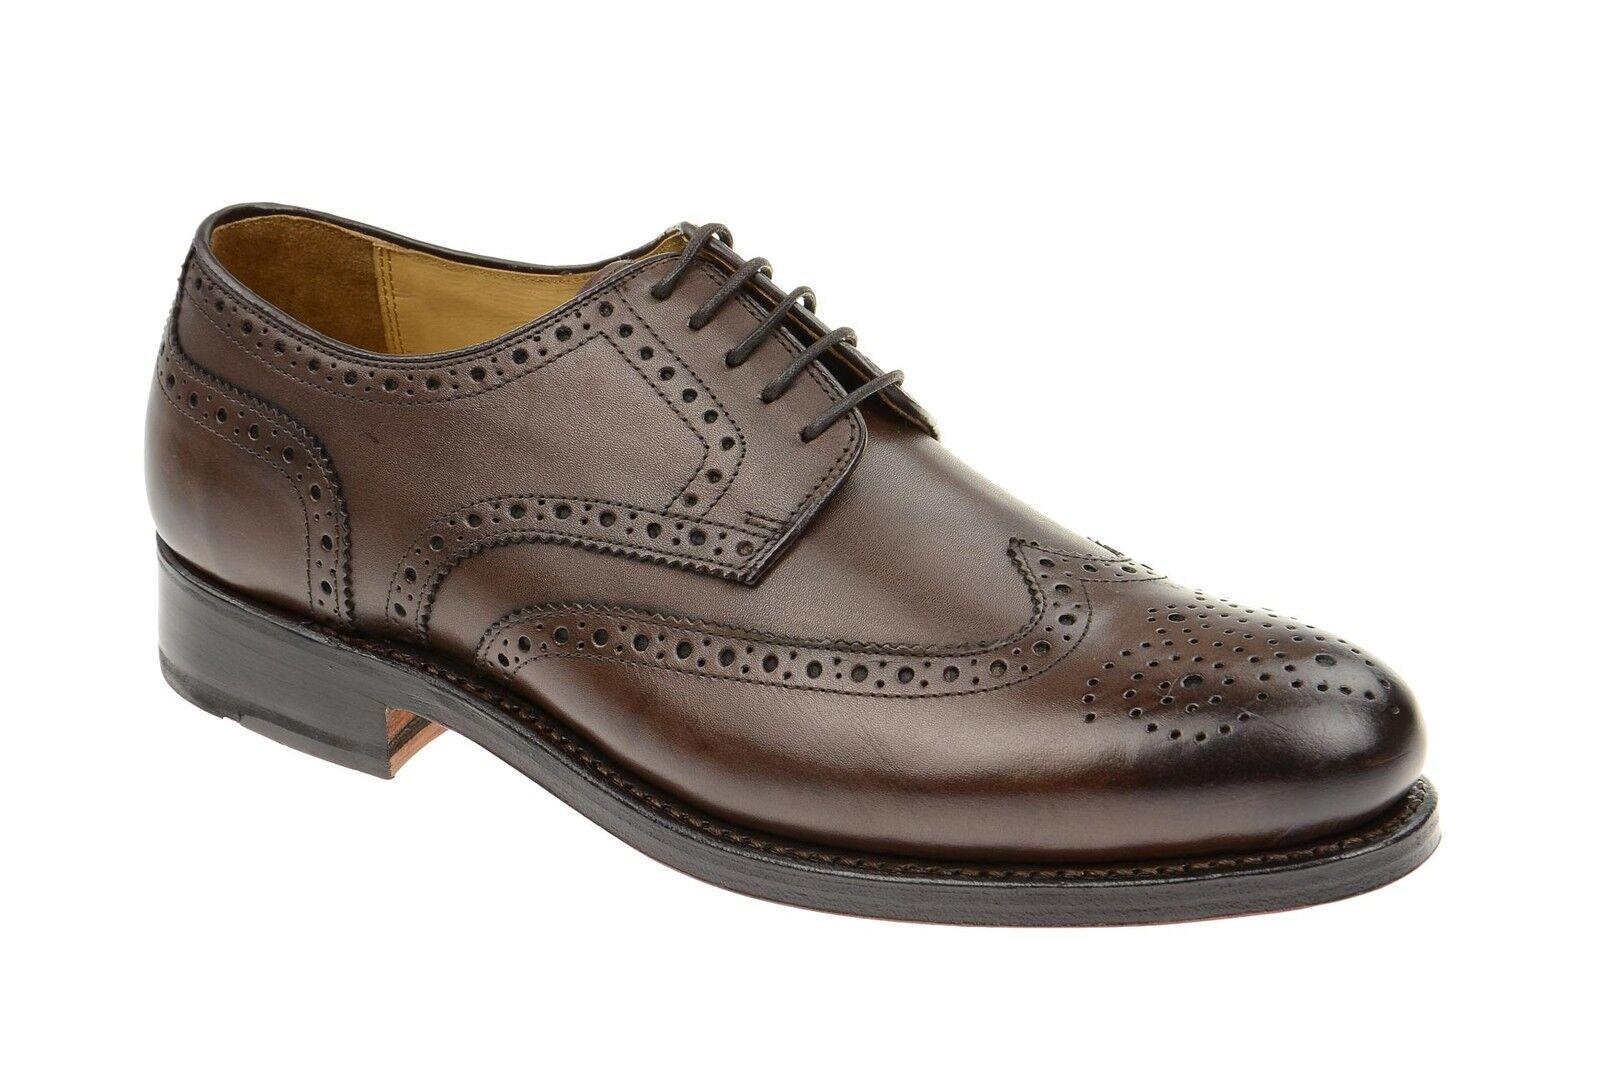 Gordon & Braun Bros. Schuhe LEVET braun Herrenschuhe rahmengenähte Schuhe 2318-B Braun & b95cf6